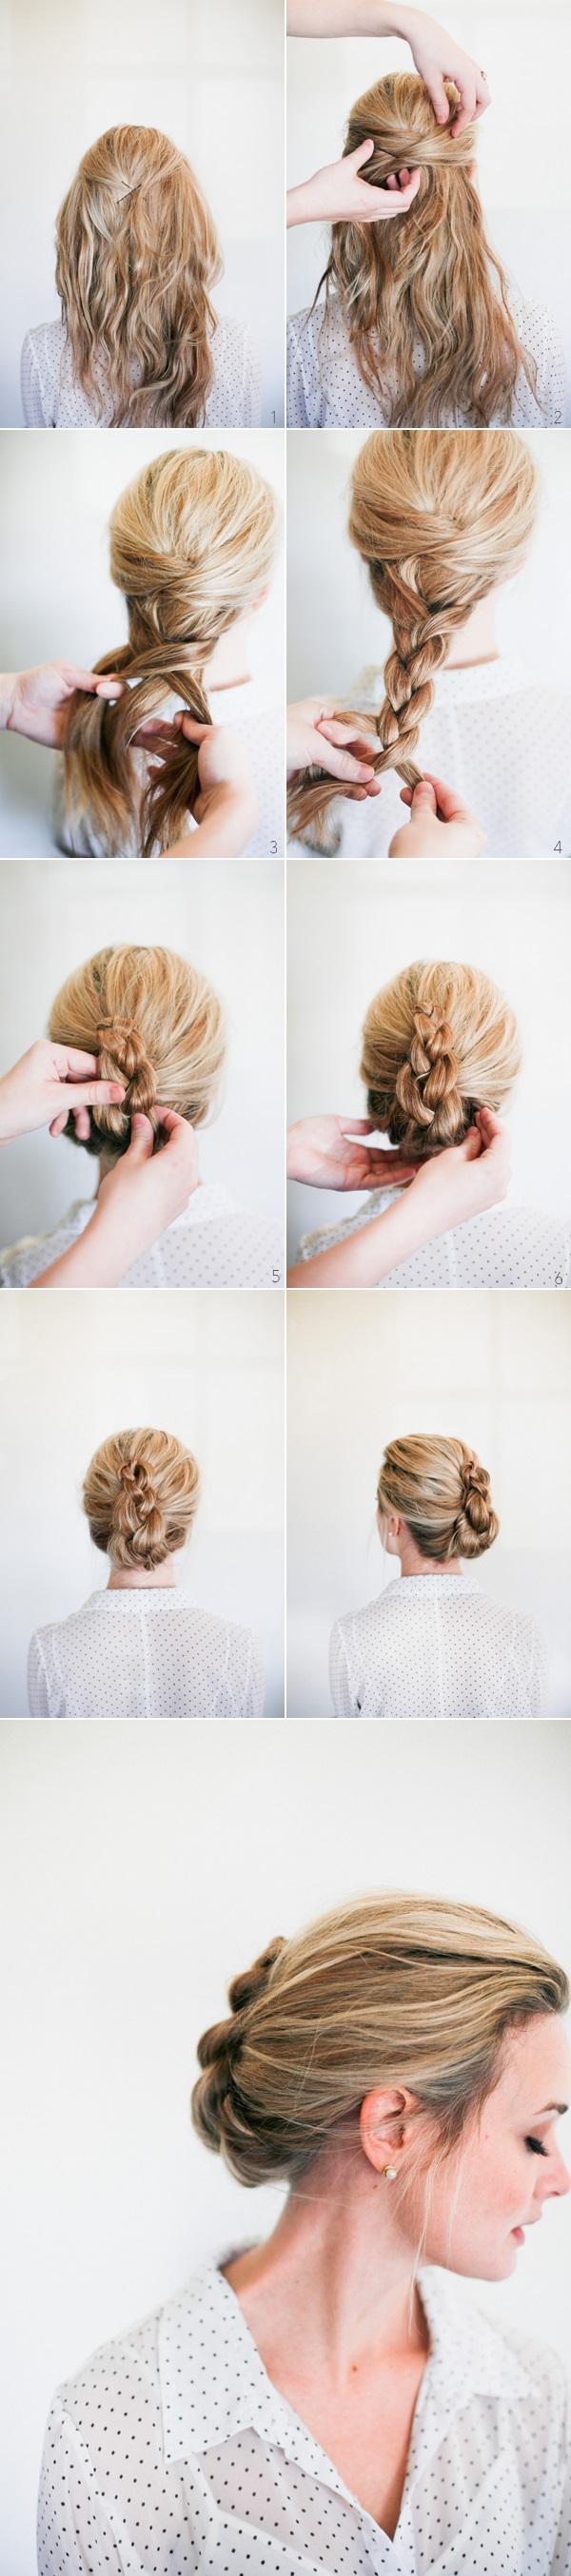 Braid Hair Tutorials 12 Ways To Braid Your Hair Hairstyles Weekly